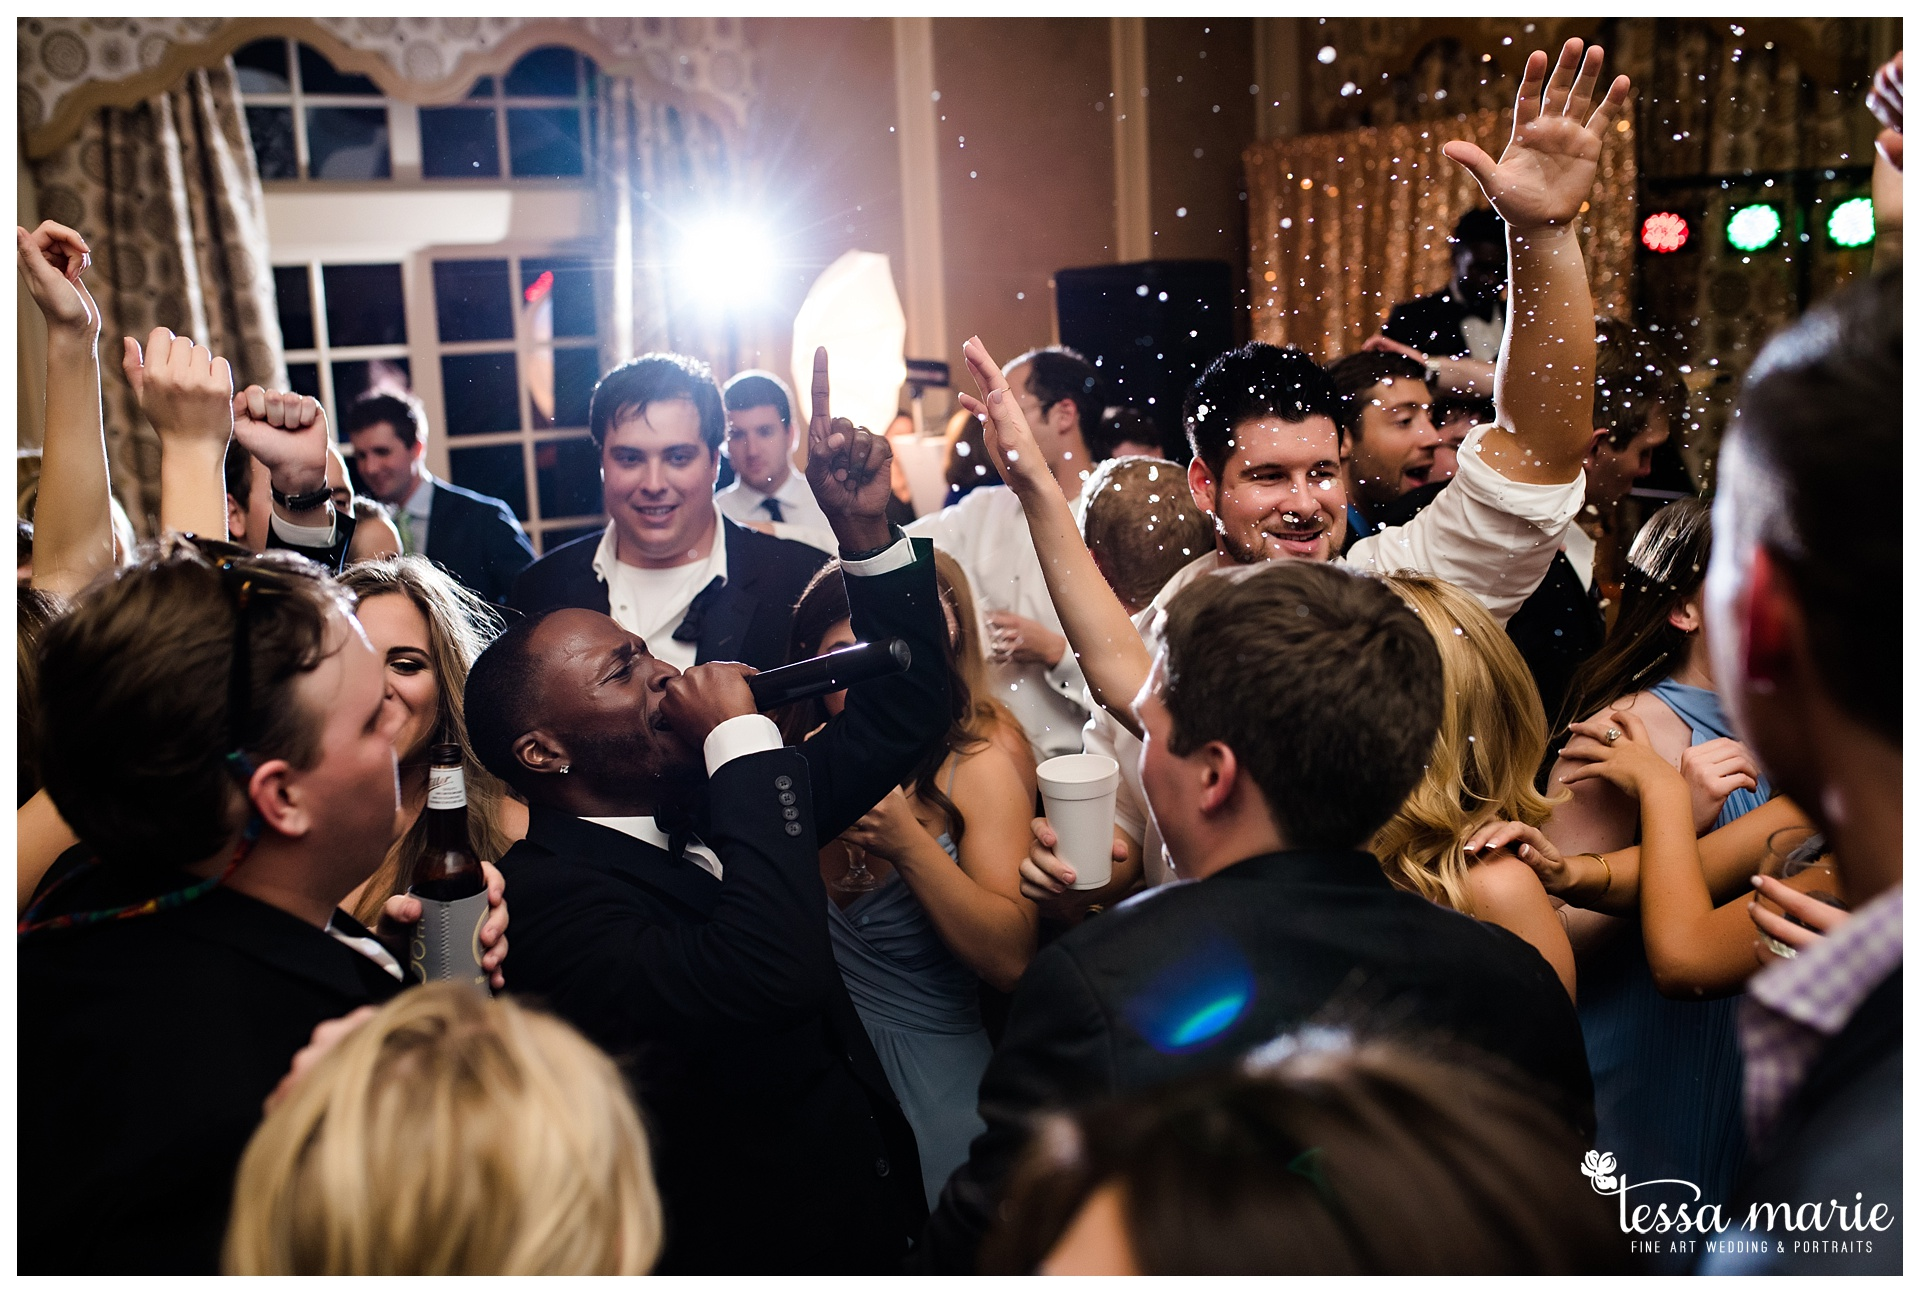 tessa_marie_weddings_legacy_story_focused_wedding_pictures_atlanta_wedding_photographer_0163